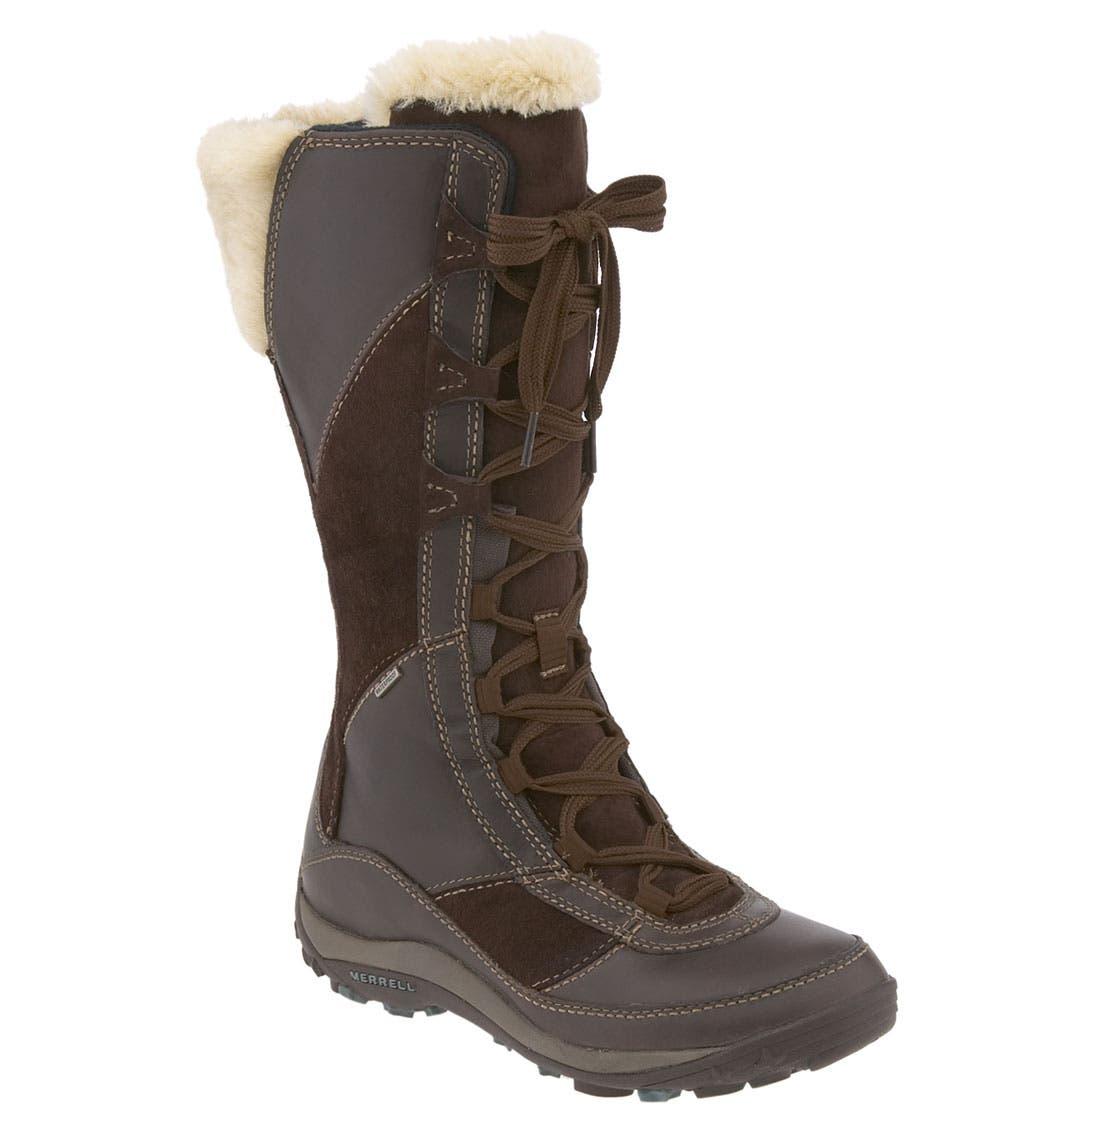 Alternate Image 1 Selected - Merrell 'Prevoz' Waterproof Tall Boot